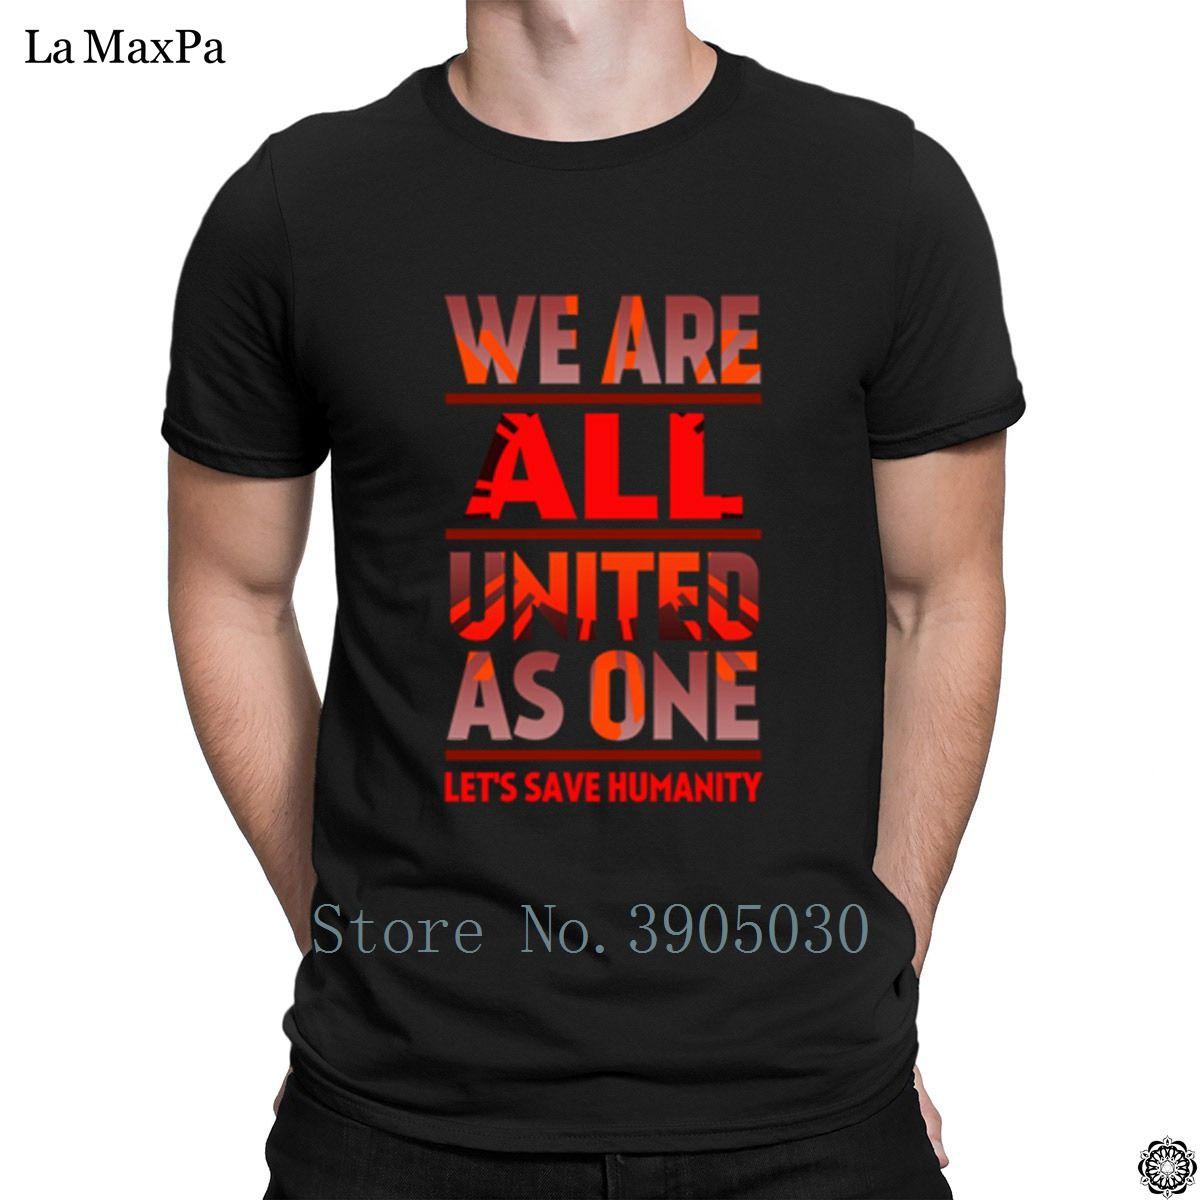 T-shirt Formal manga curta Man United Como One By Aquamarine Mens T Shirt Authentic Camiseta Unisex Branded Pop Top Tee